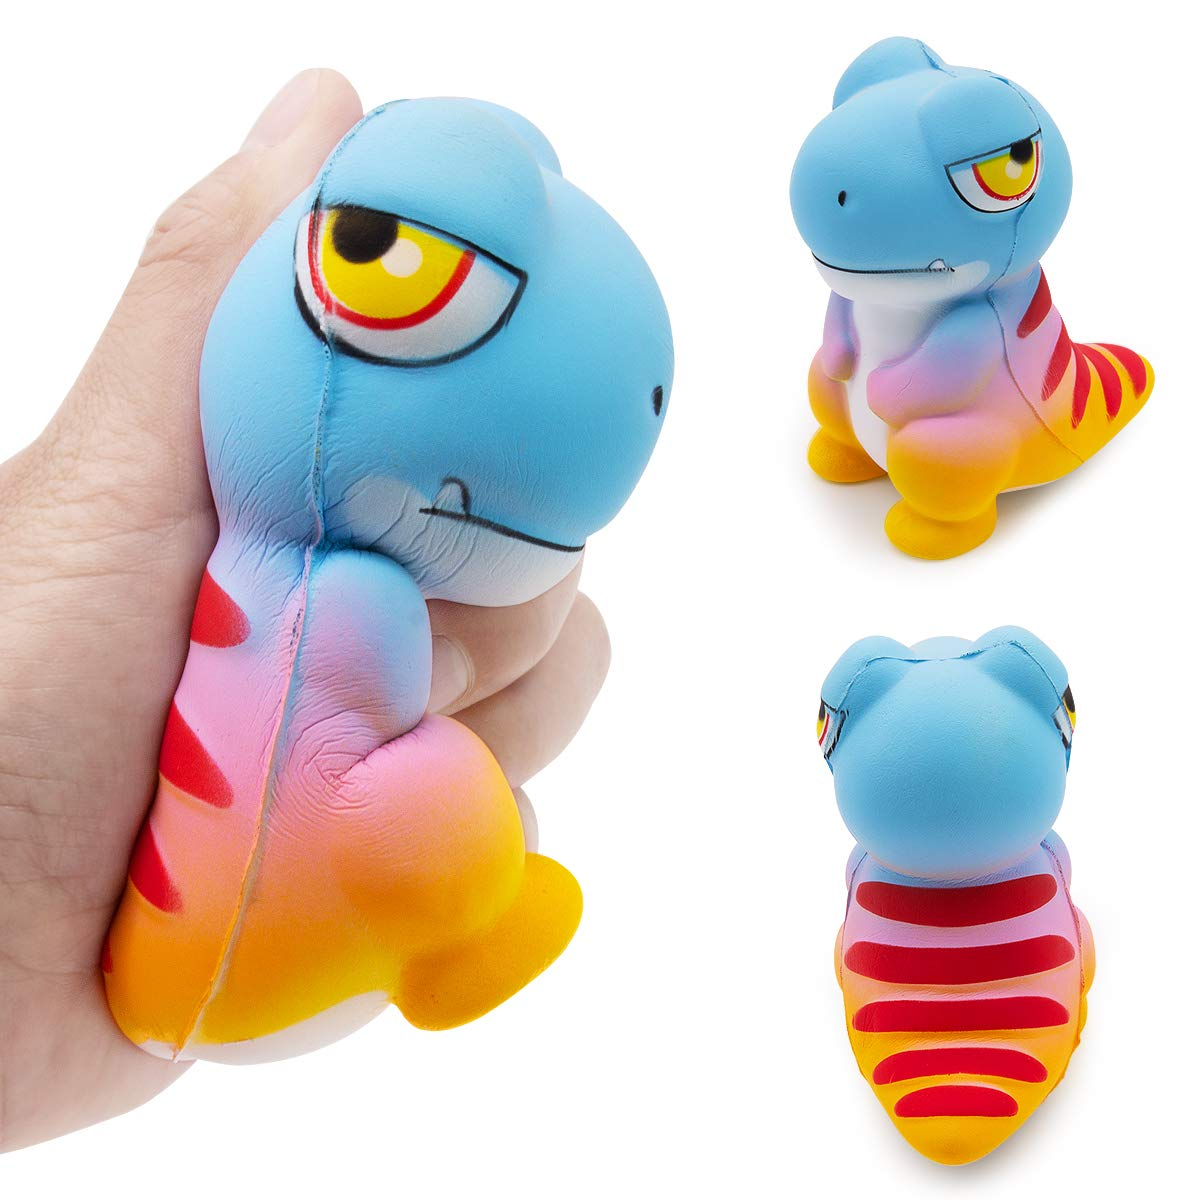 SPECOOL Antiestres Squishy Kawaii Dinosaurio Squishy Juguete Slow Rising Squeeze Perfumada Suave Antiestrés Regalo para Niños Adultos